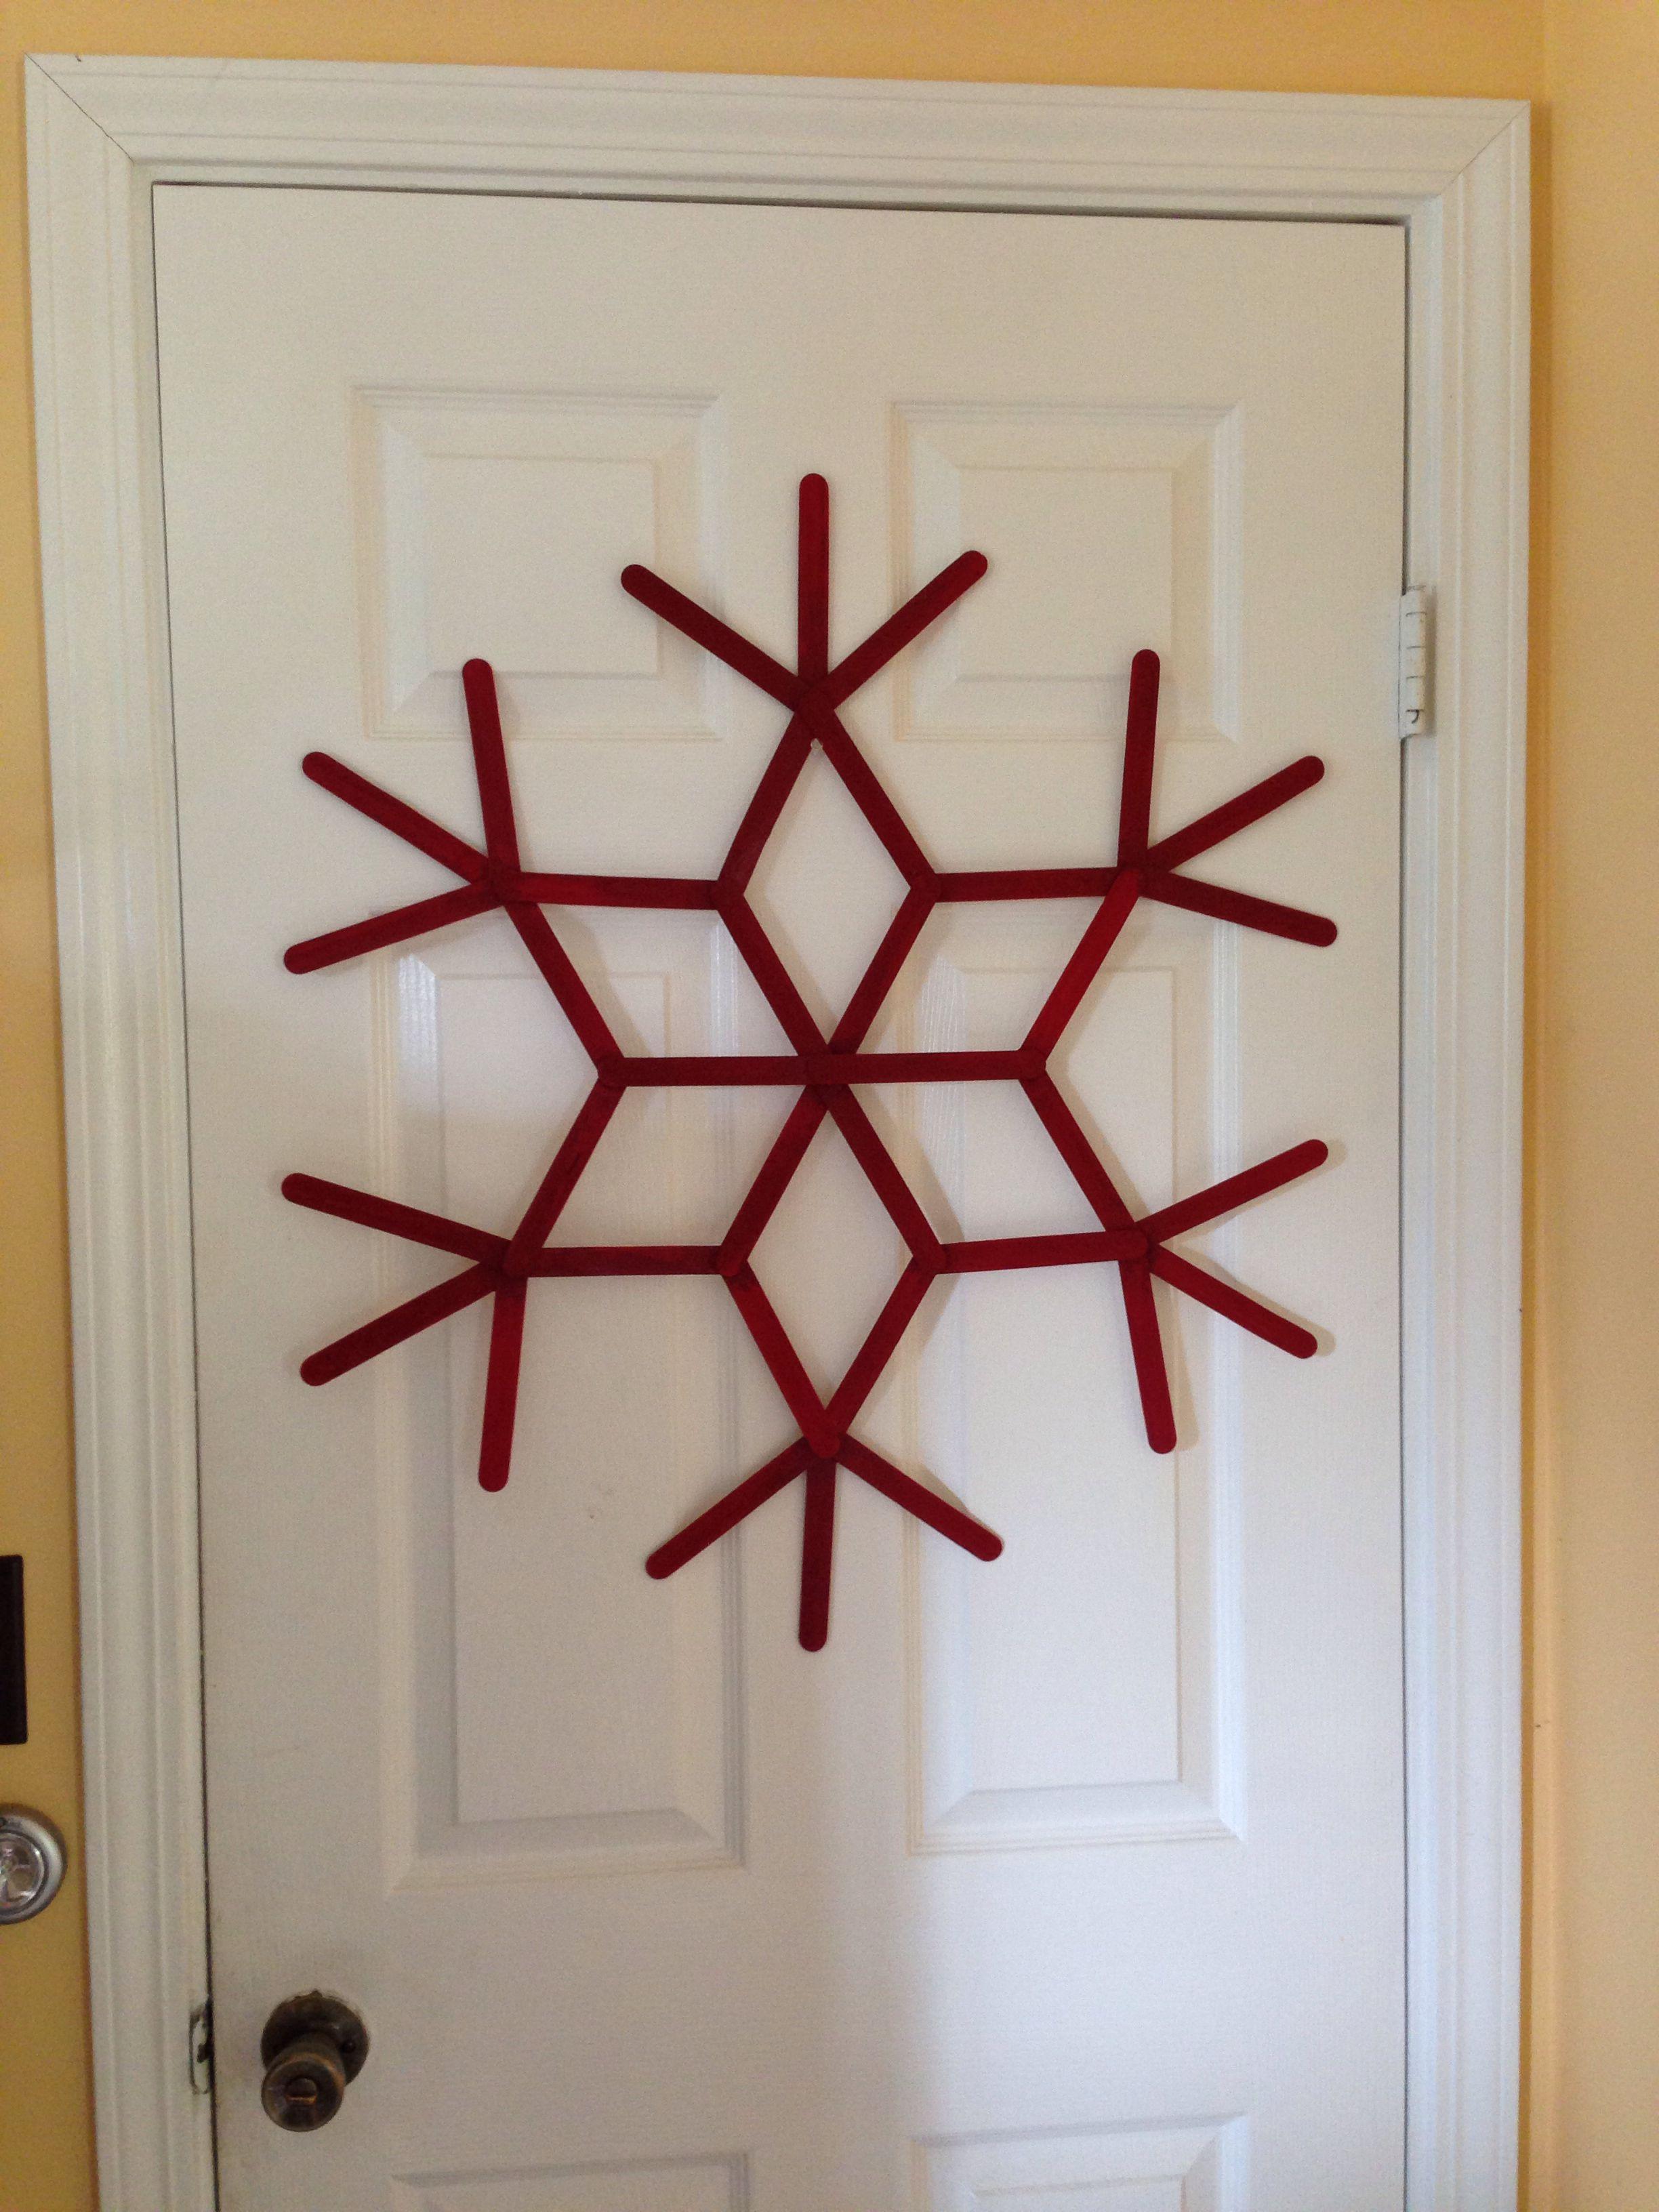 Popsicle stick snowflakes Nailed it Pinterest